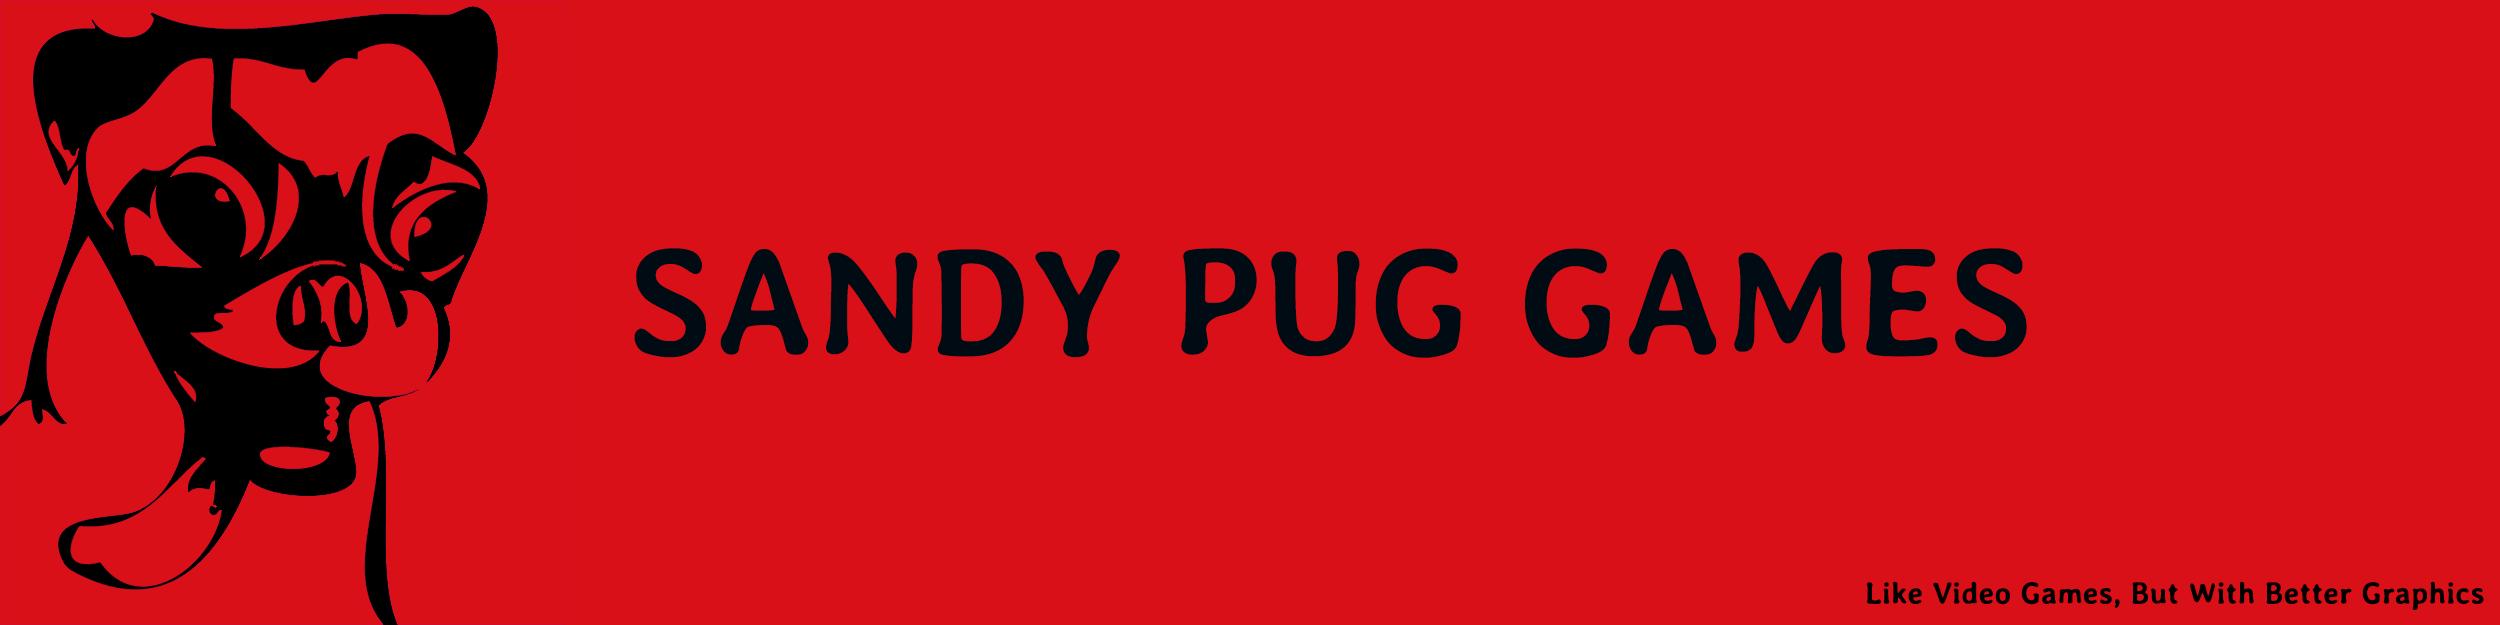 Sandy Pug Games